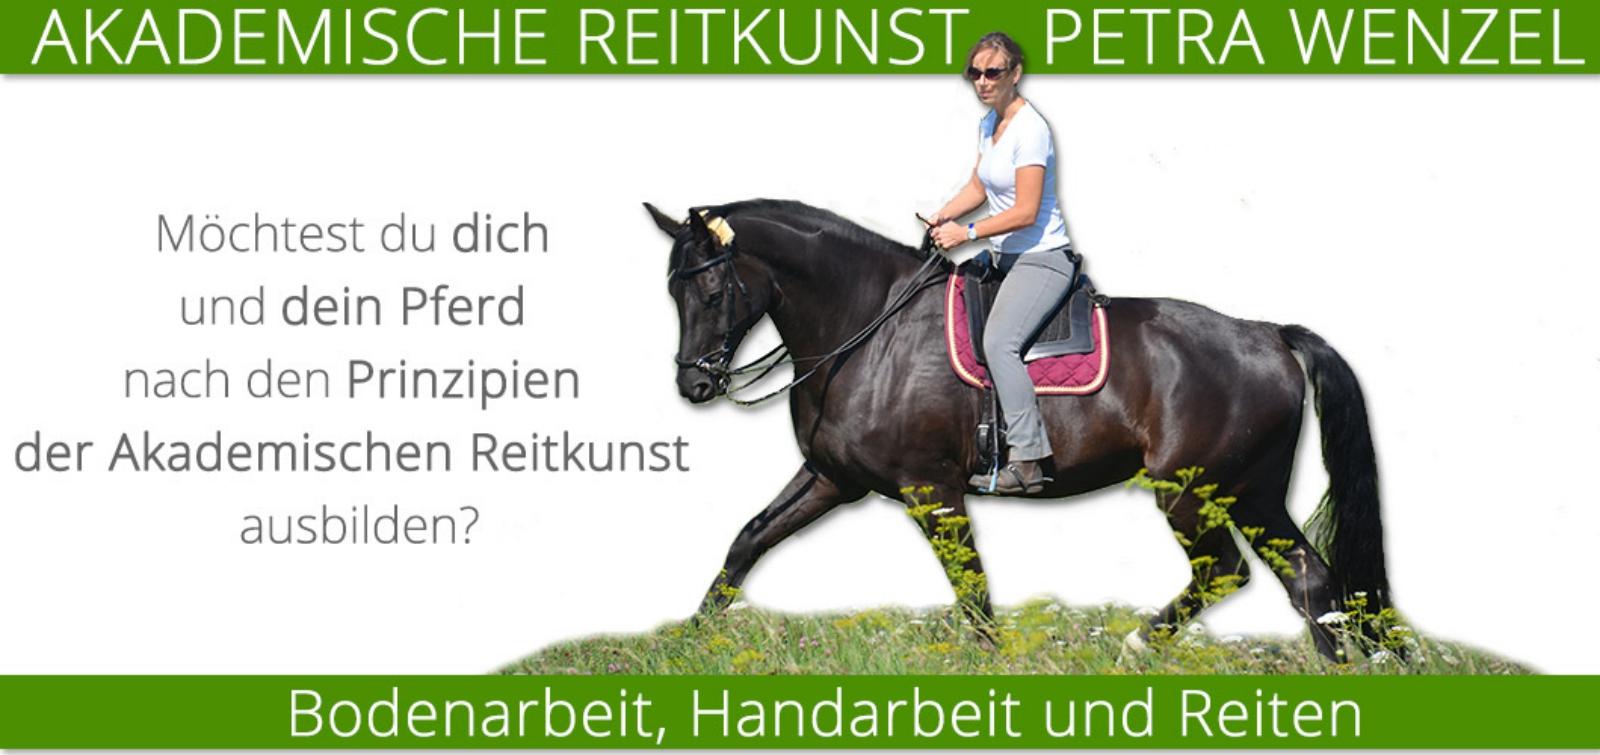 Akademische Reitkunst - Petra Wenzel